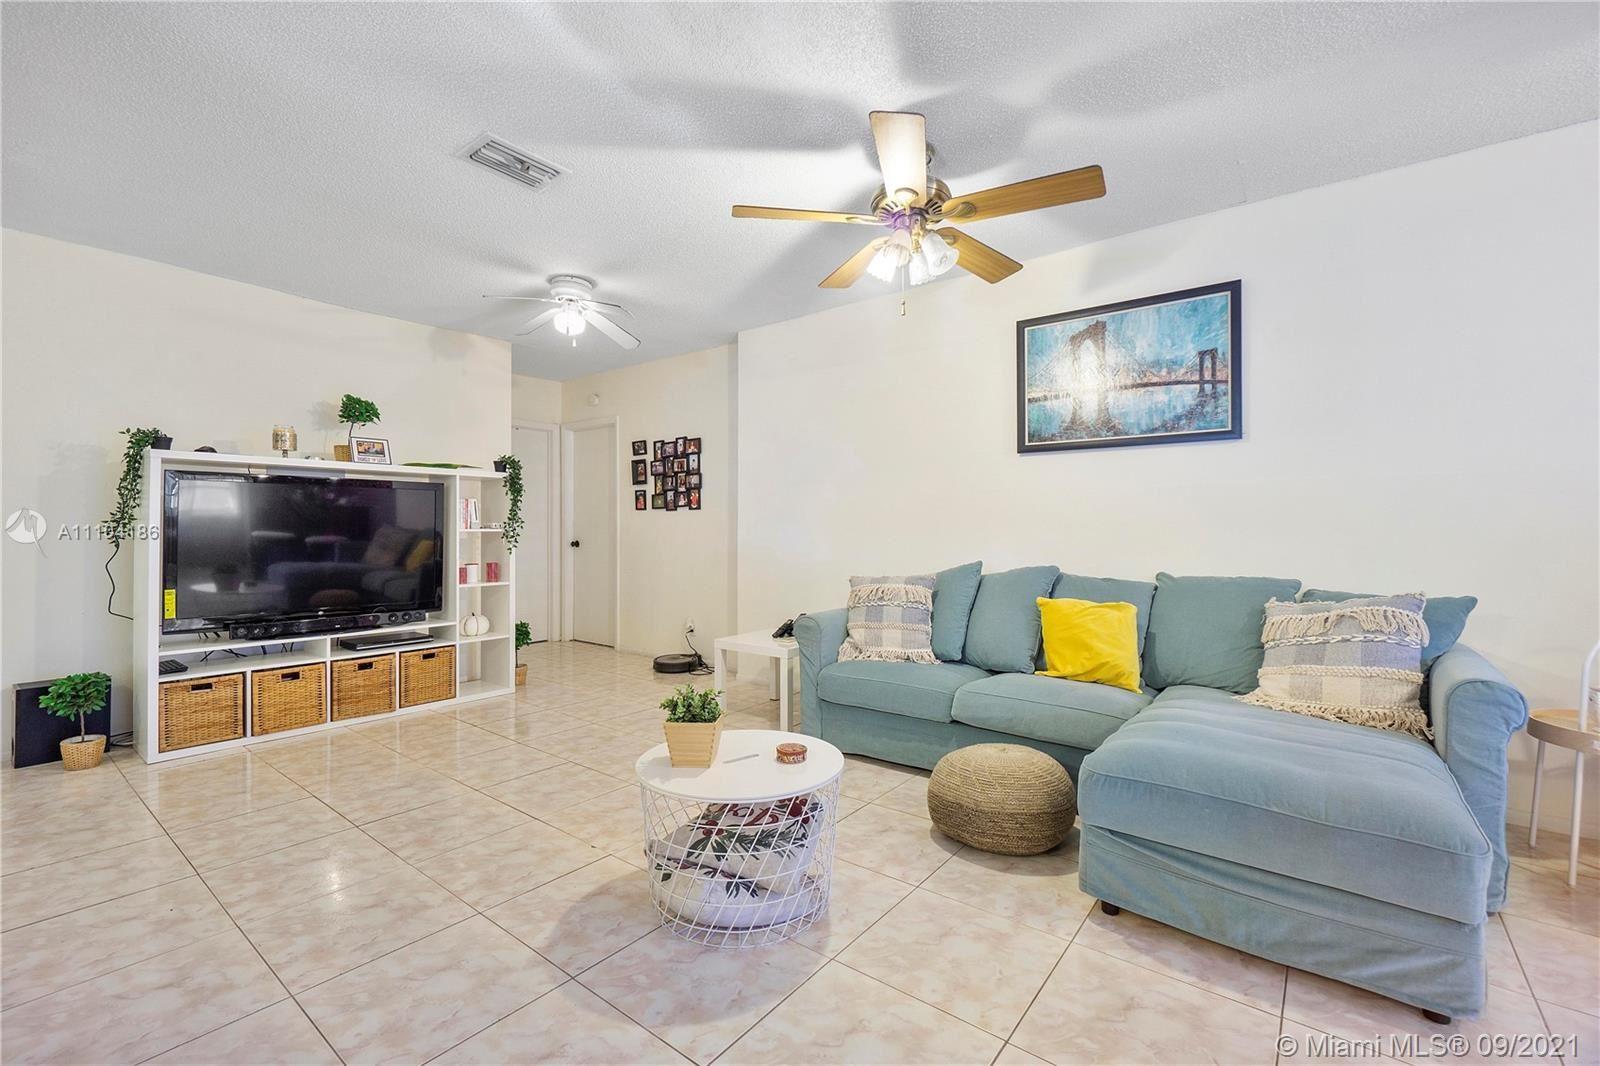 Photo of 4600 SW 43rd Ter, Dania Beach, FL 33314 (MLS # A11104186)